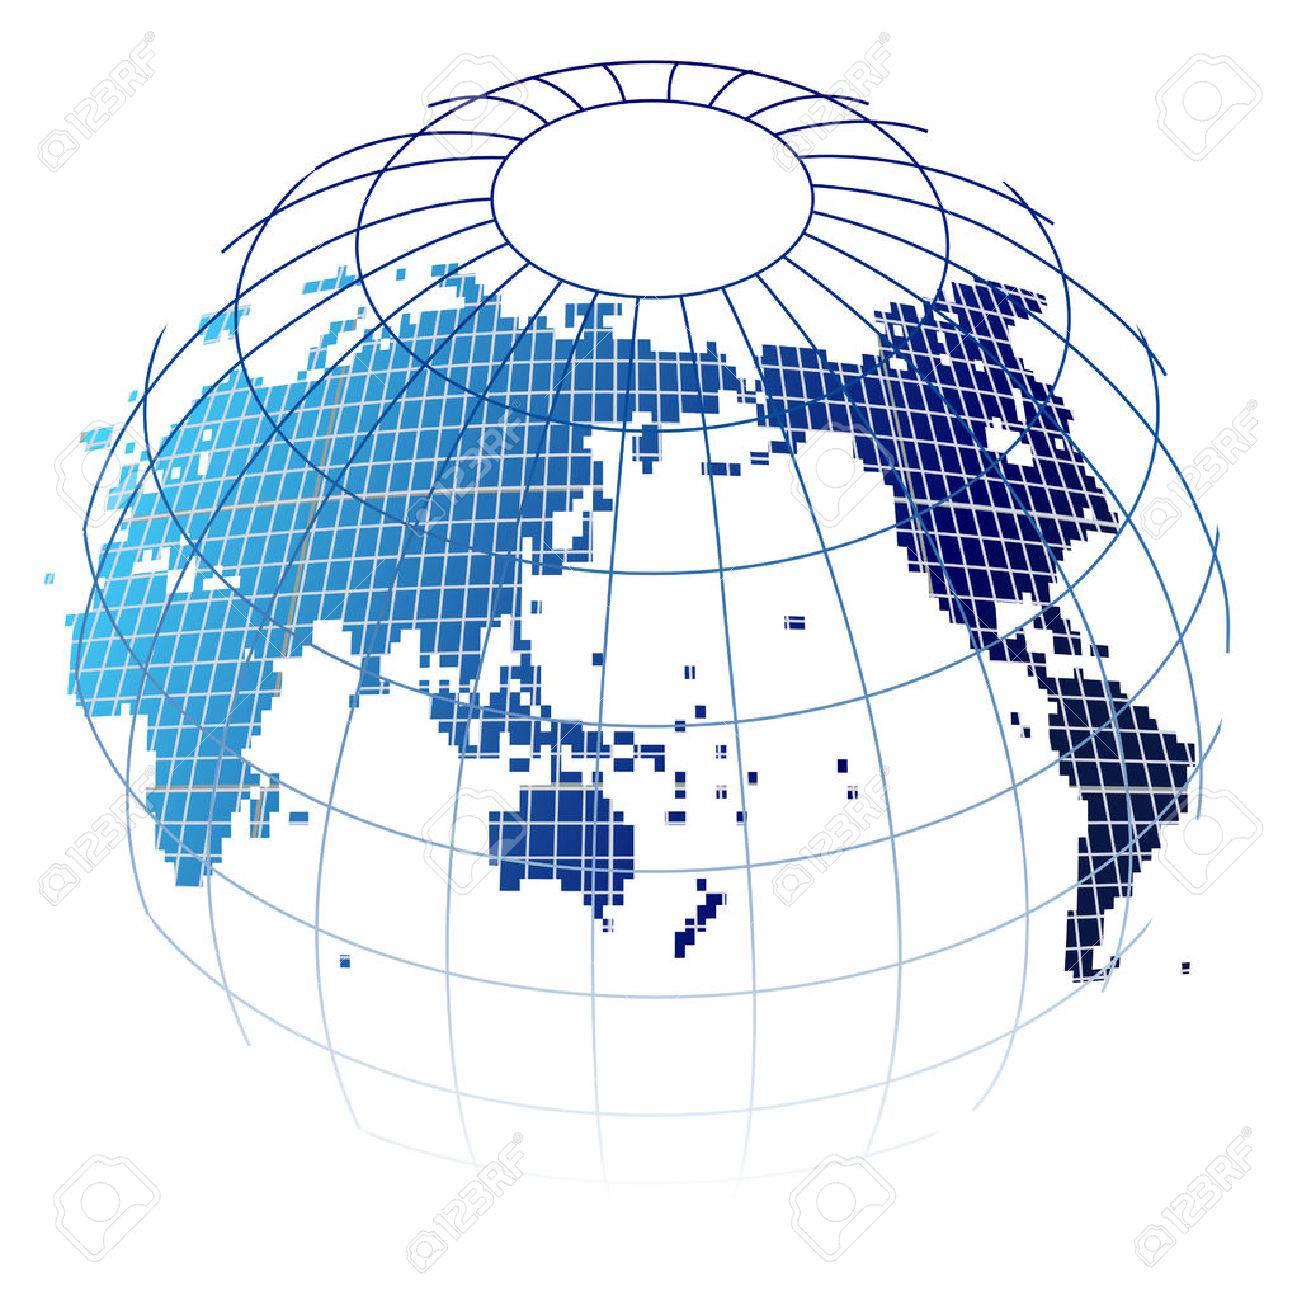 World map globe icon - 60649027